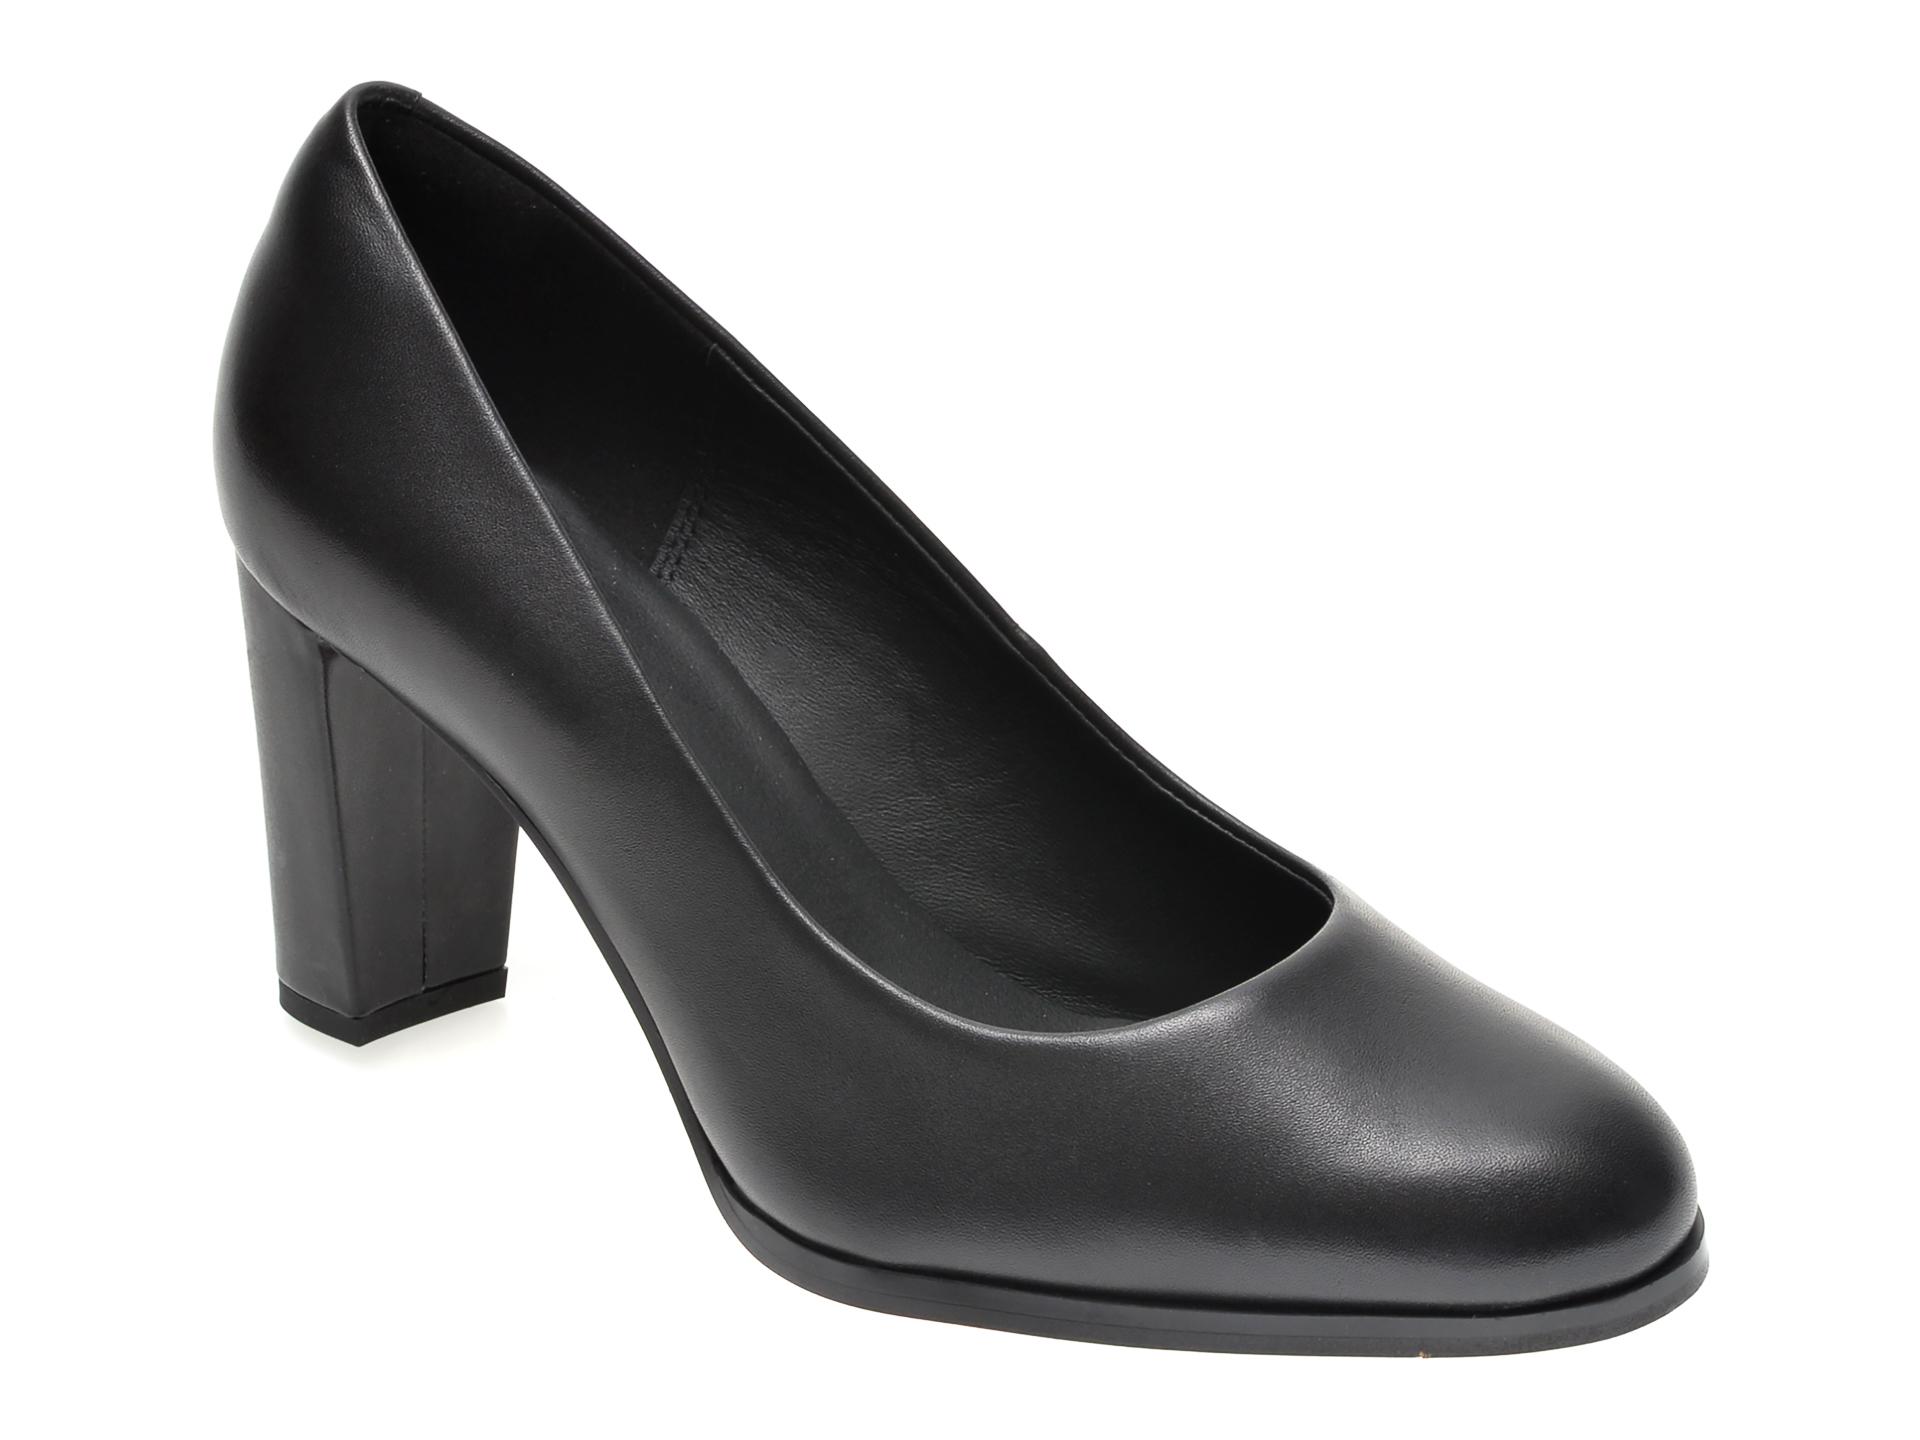 Pantofi CLARKS negri, KAYLIN CARA, din piele naturala imagine